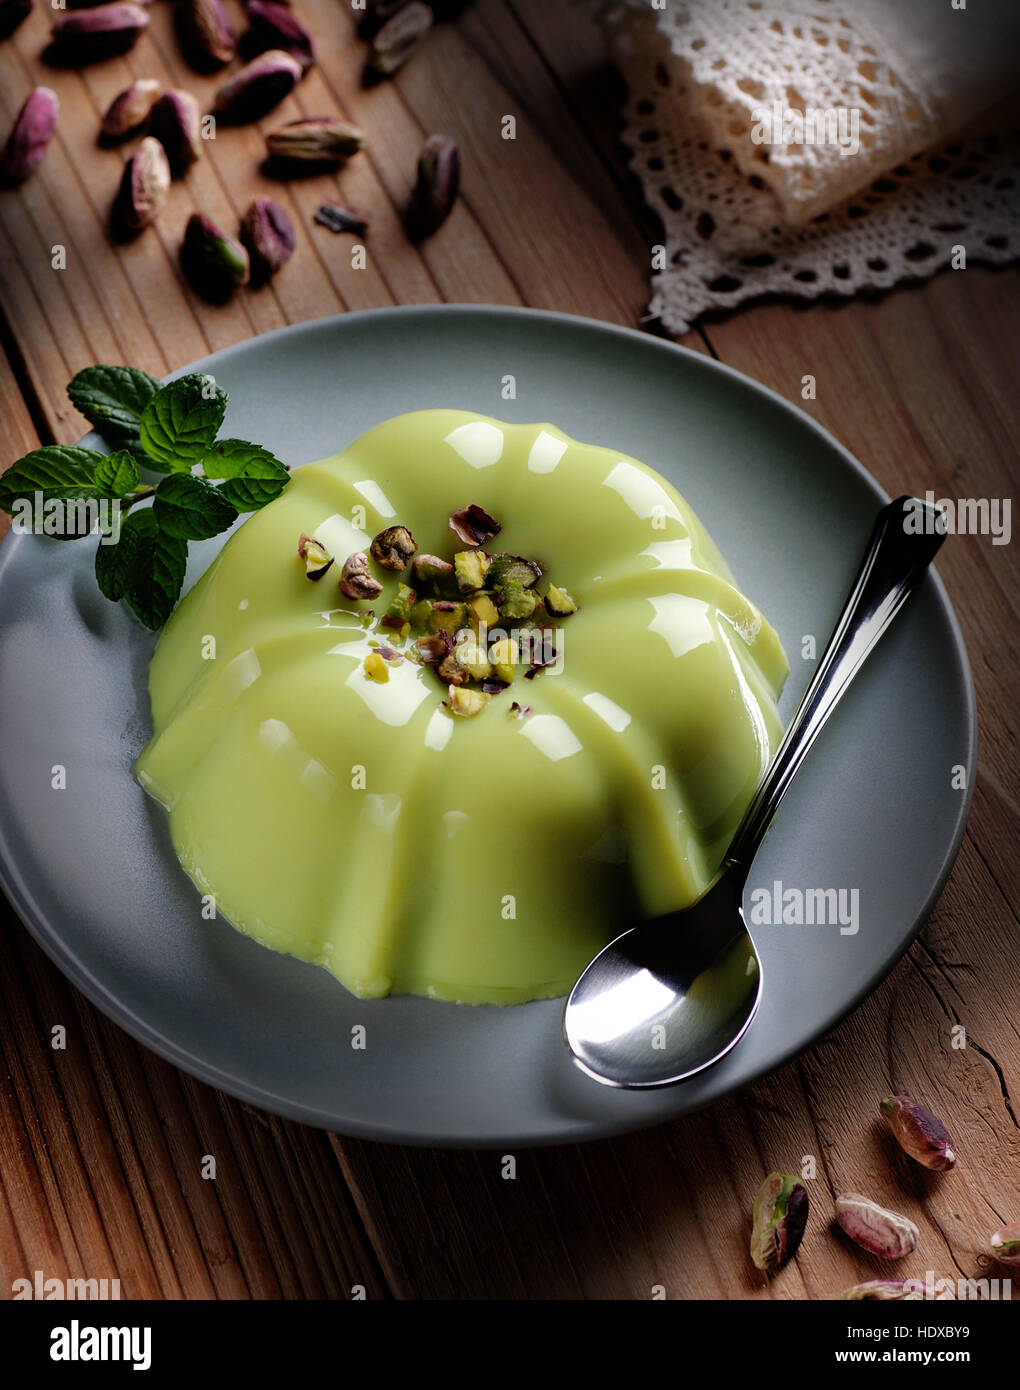 pistachio pudding with ingredients around - Stock Image